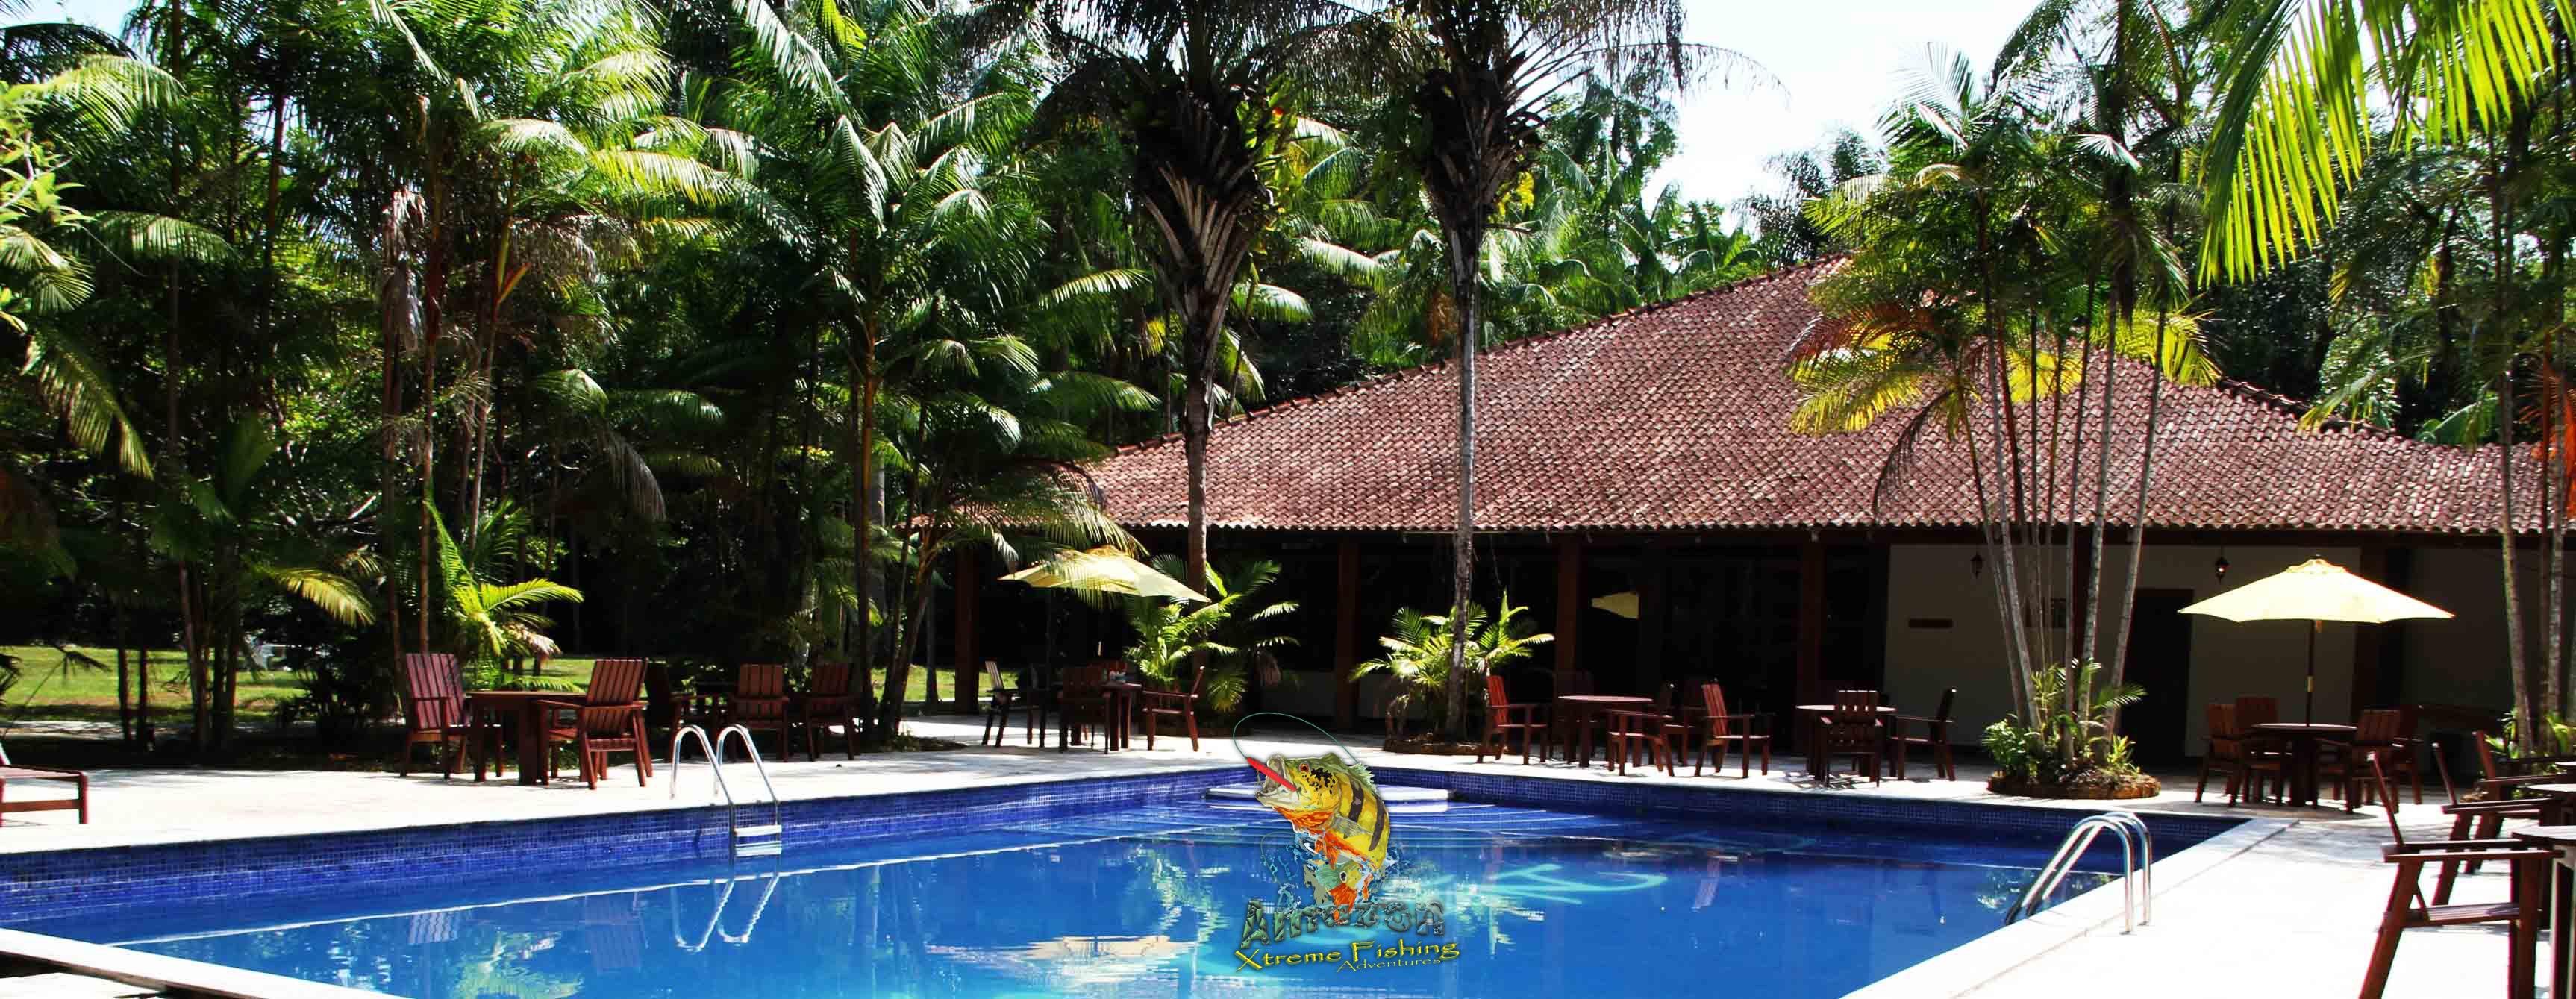 Rio Negro Lodge - Amazon Xtreme Fishing